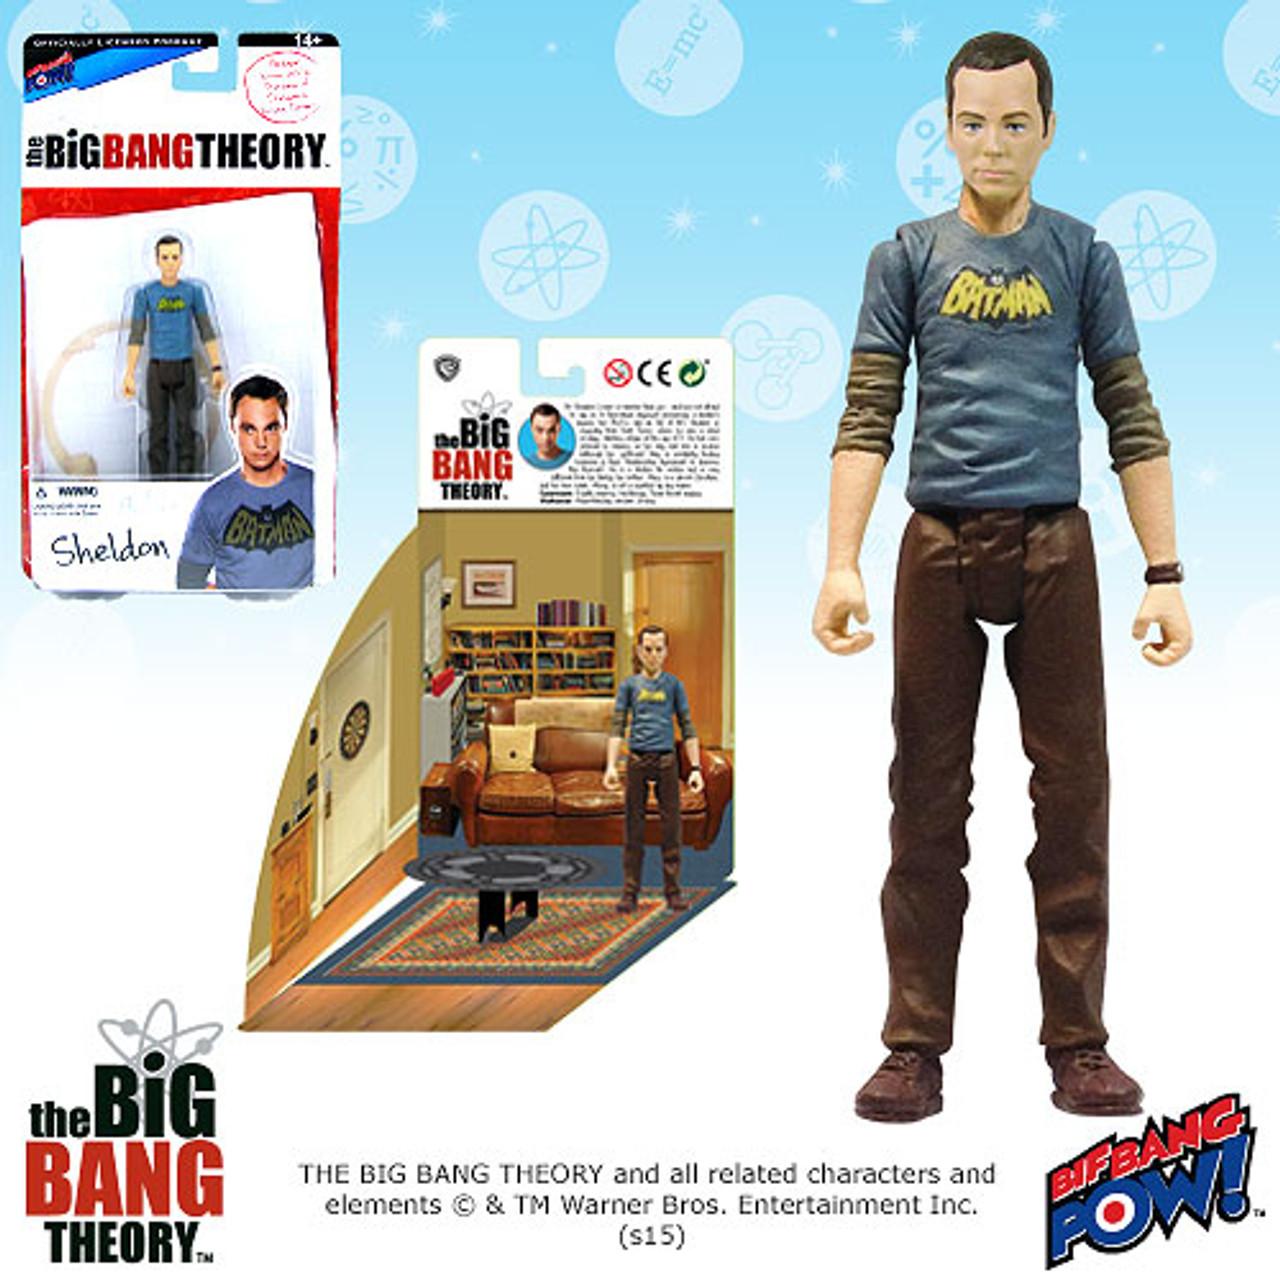 Con Excl Action Figures Bif Bang Pow The Big Bang Theory Star Trek Sheldon 3 3//4-Inch Fig